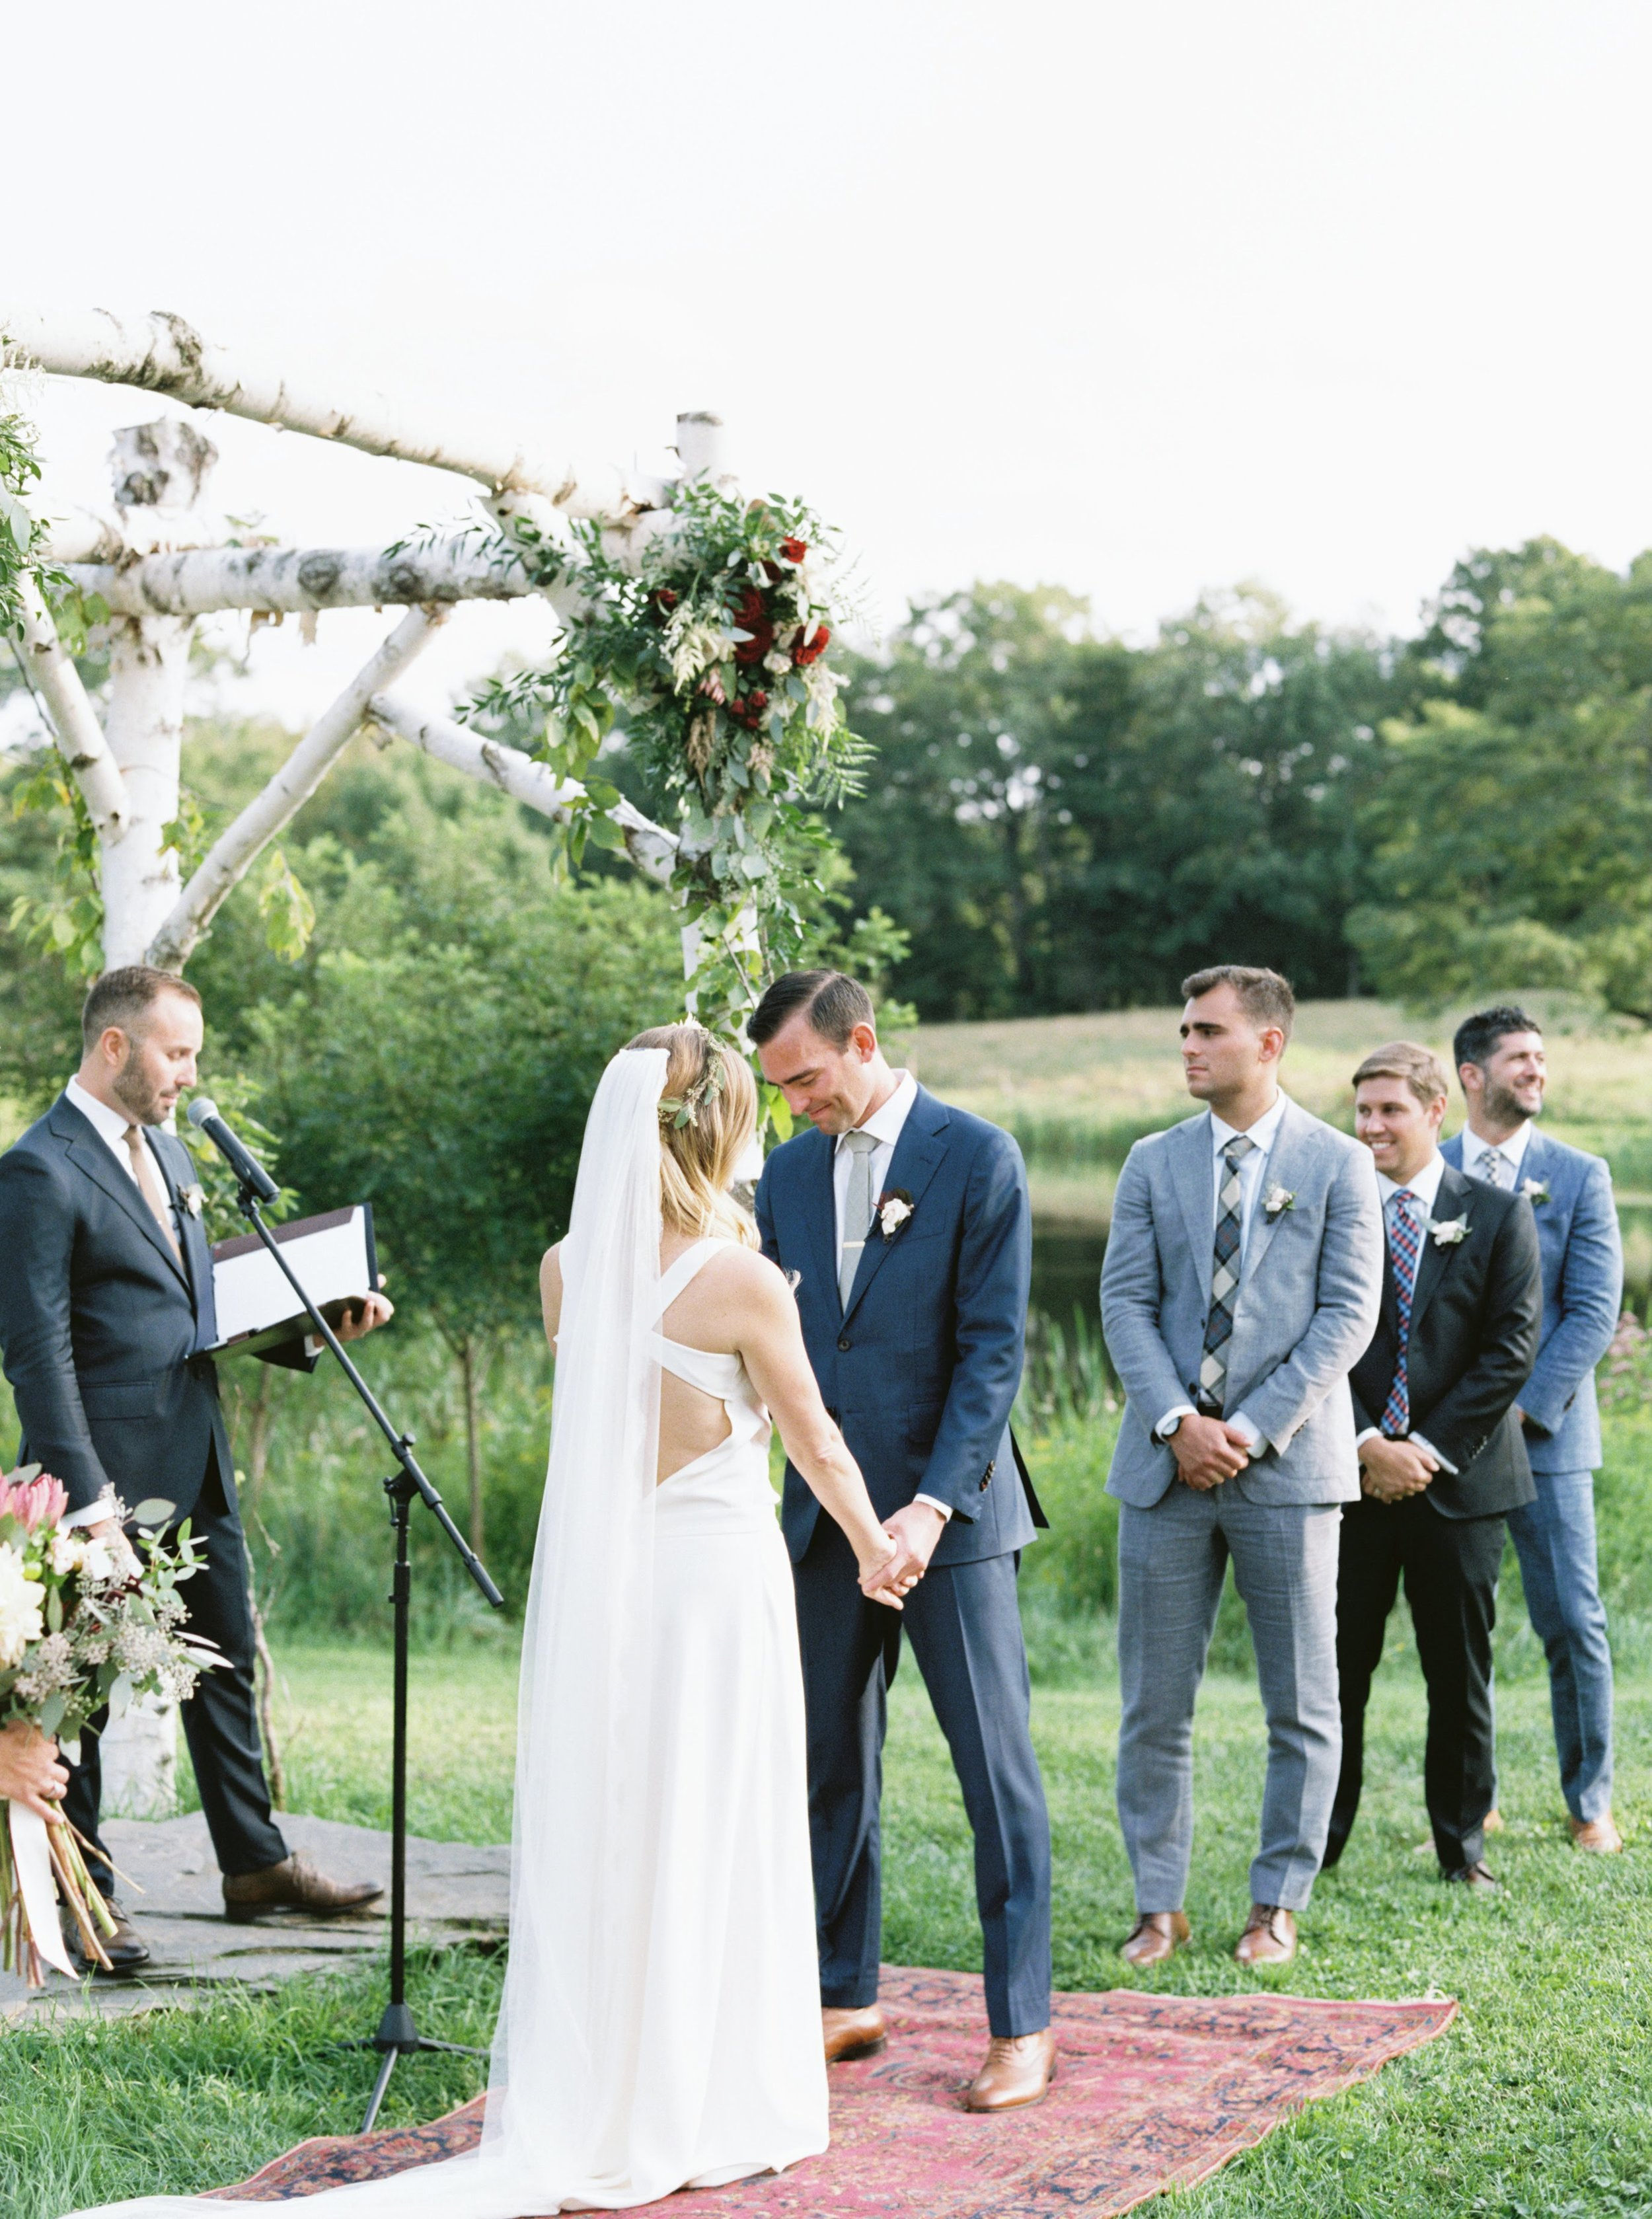 Courtney + Matt Blenheim Hill Farm Catskills NY Wedding Veronica Lola Photography 2017-398.jpg